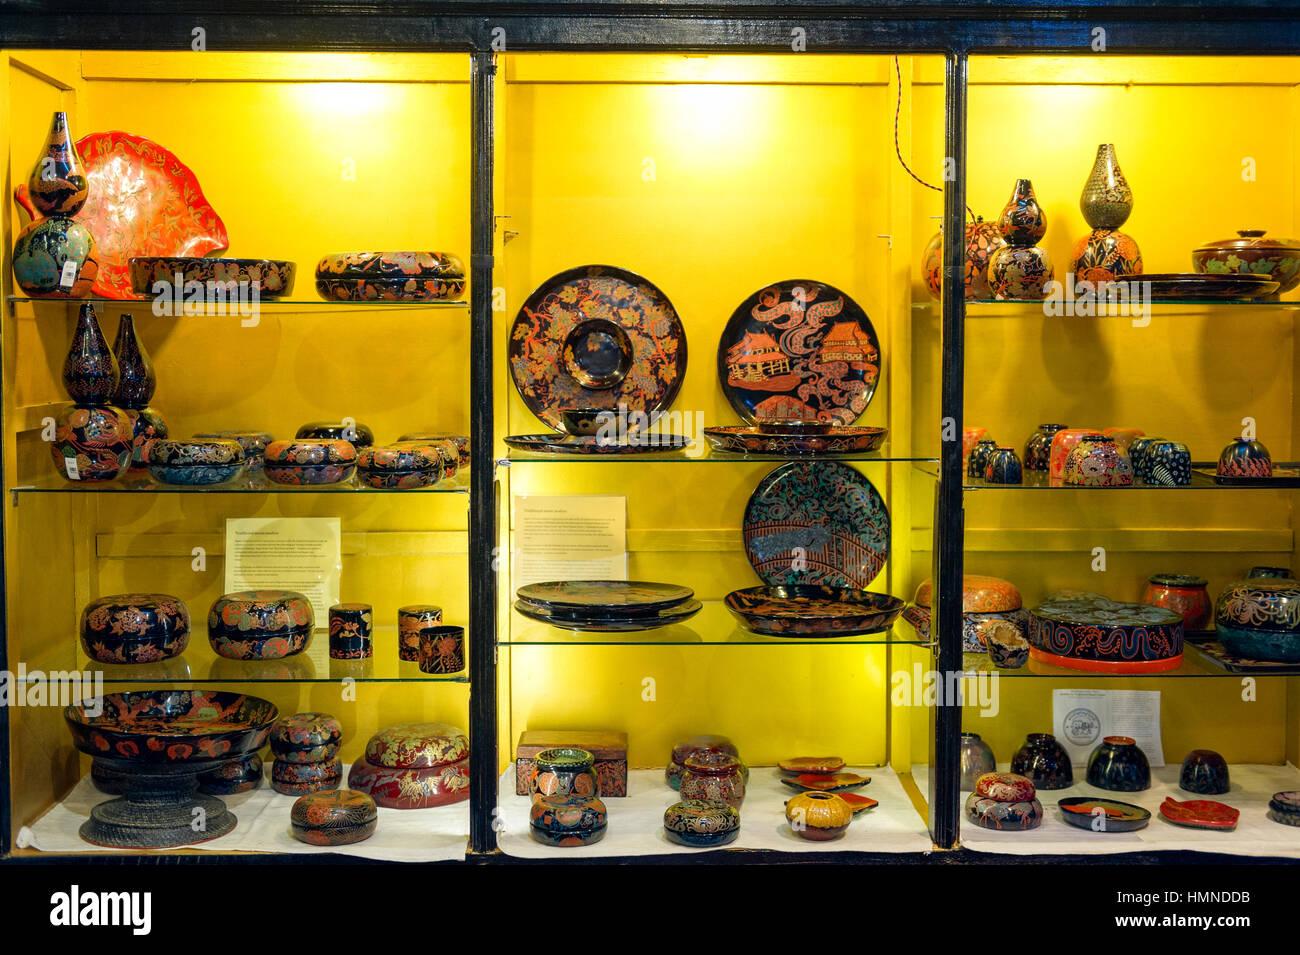 Myanmar (ex Birmanie). Bagan, Mandalay regione. Fabbricazione di oggetti laccati Immagini Stock